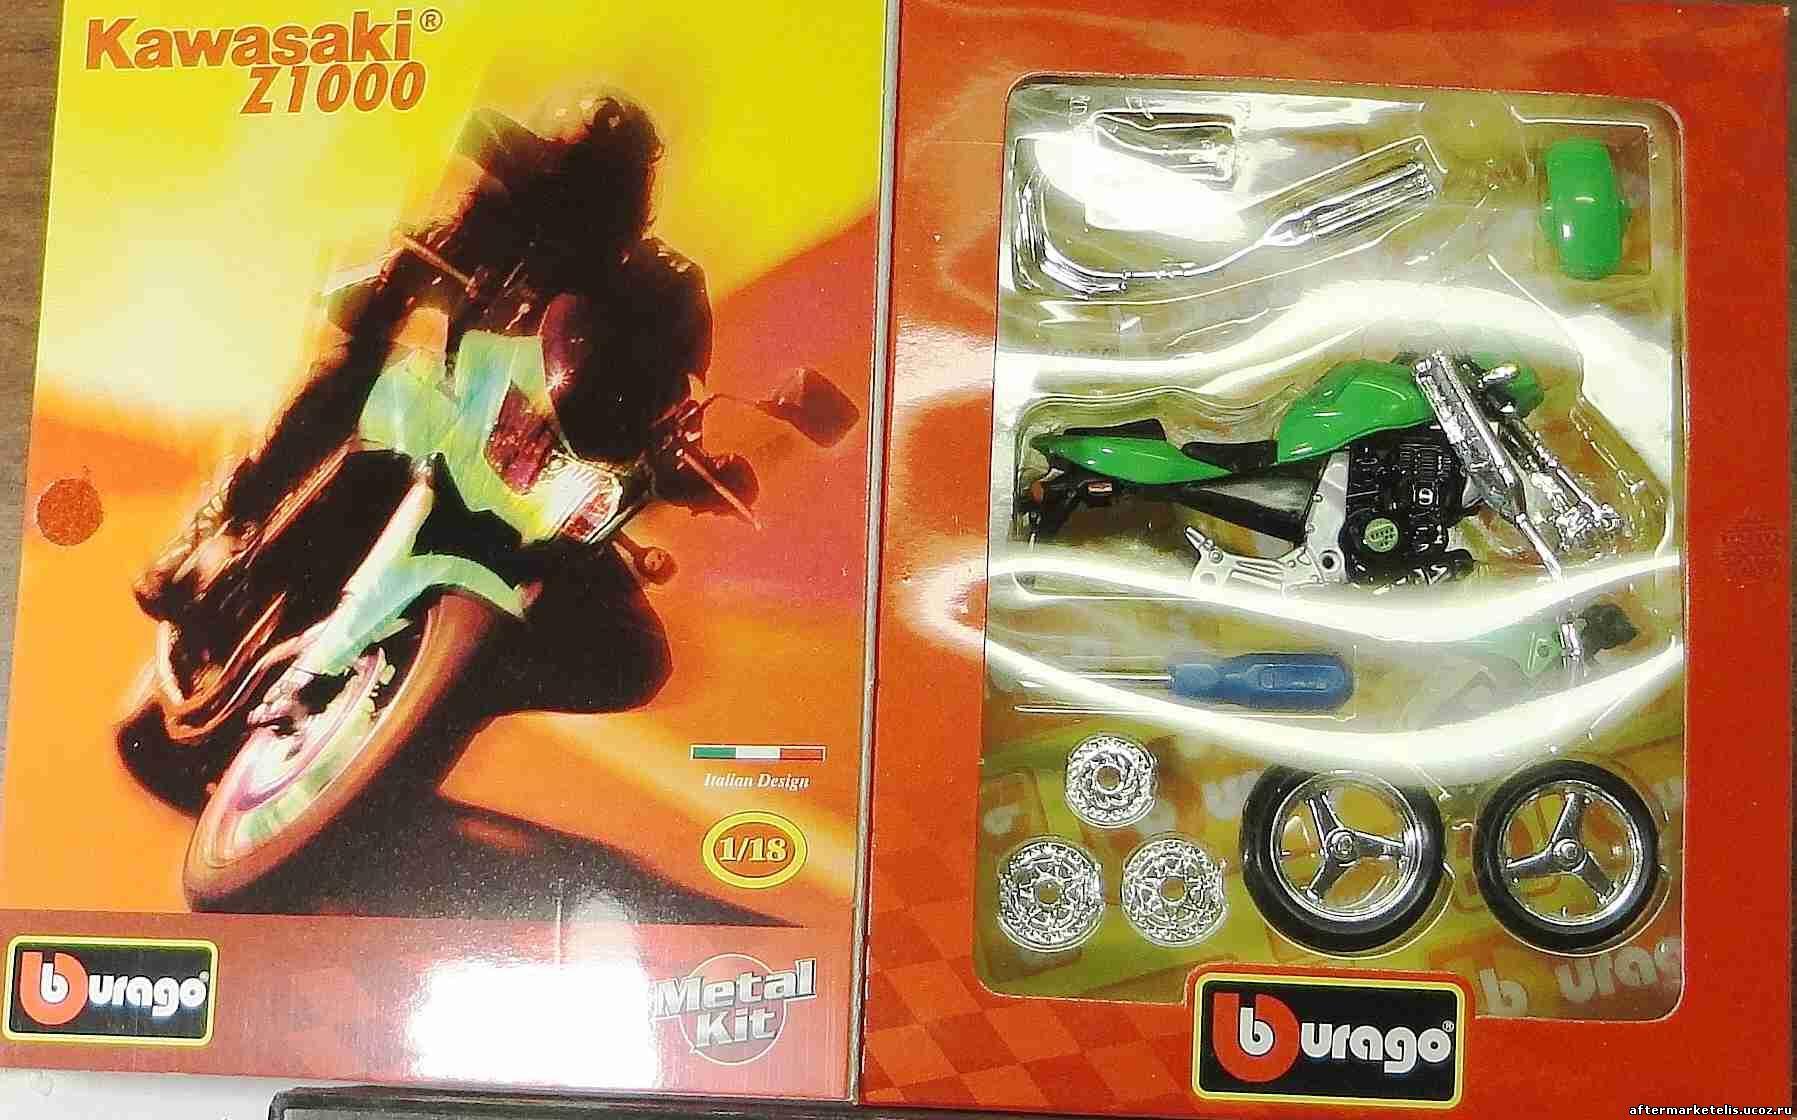 Kawasaki Z 1000 Bburago-kit